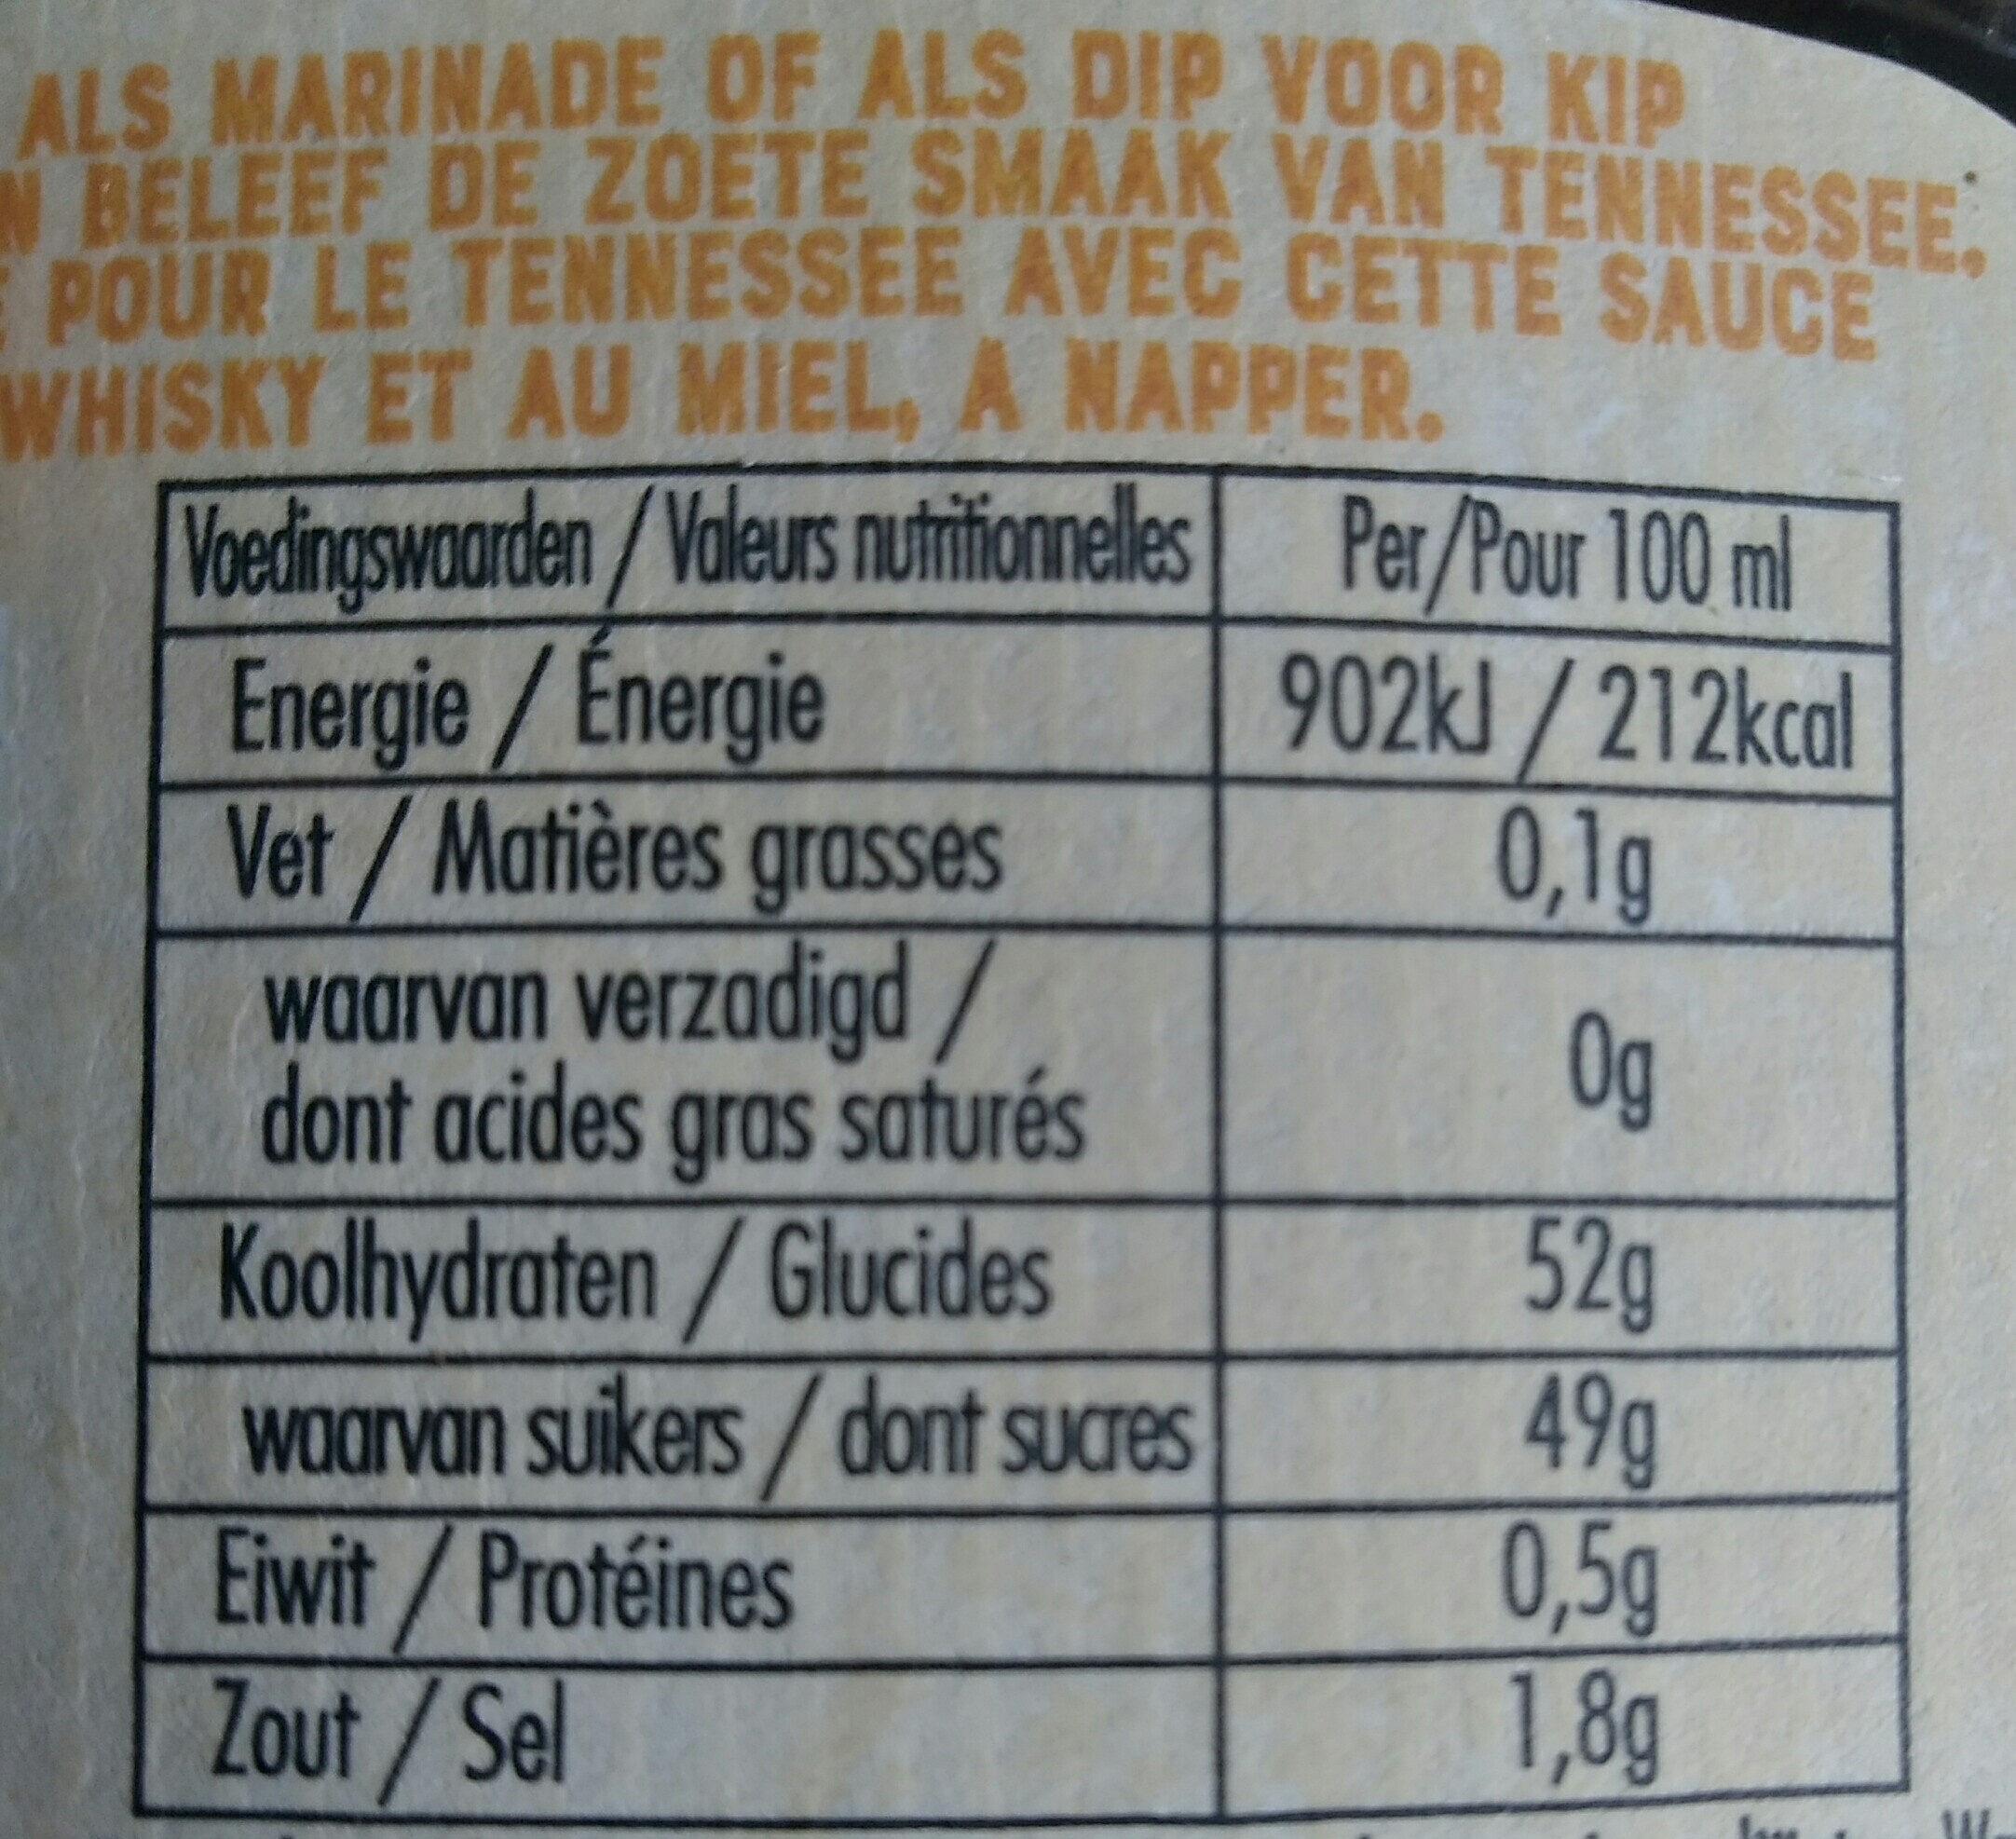 sauce à napper, bull's-eye, Sweet whiskey - Nutrition facts - fr